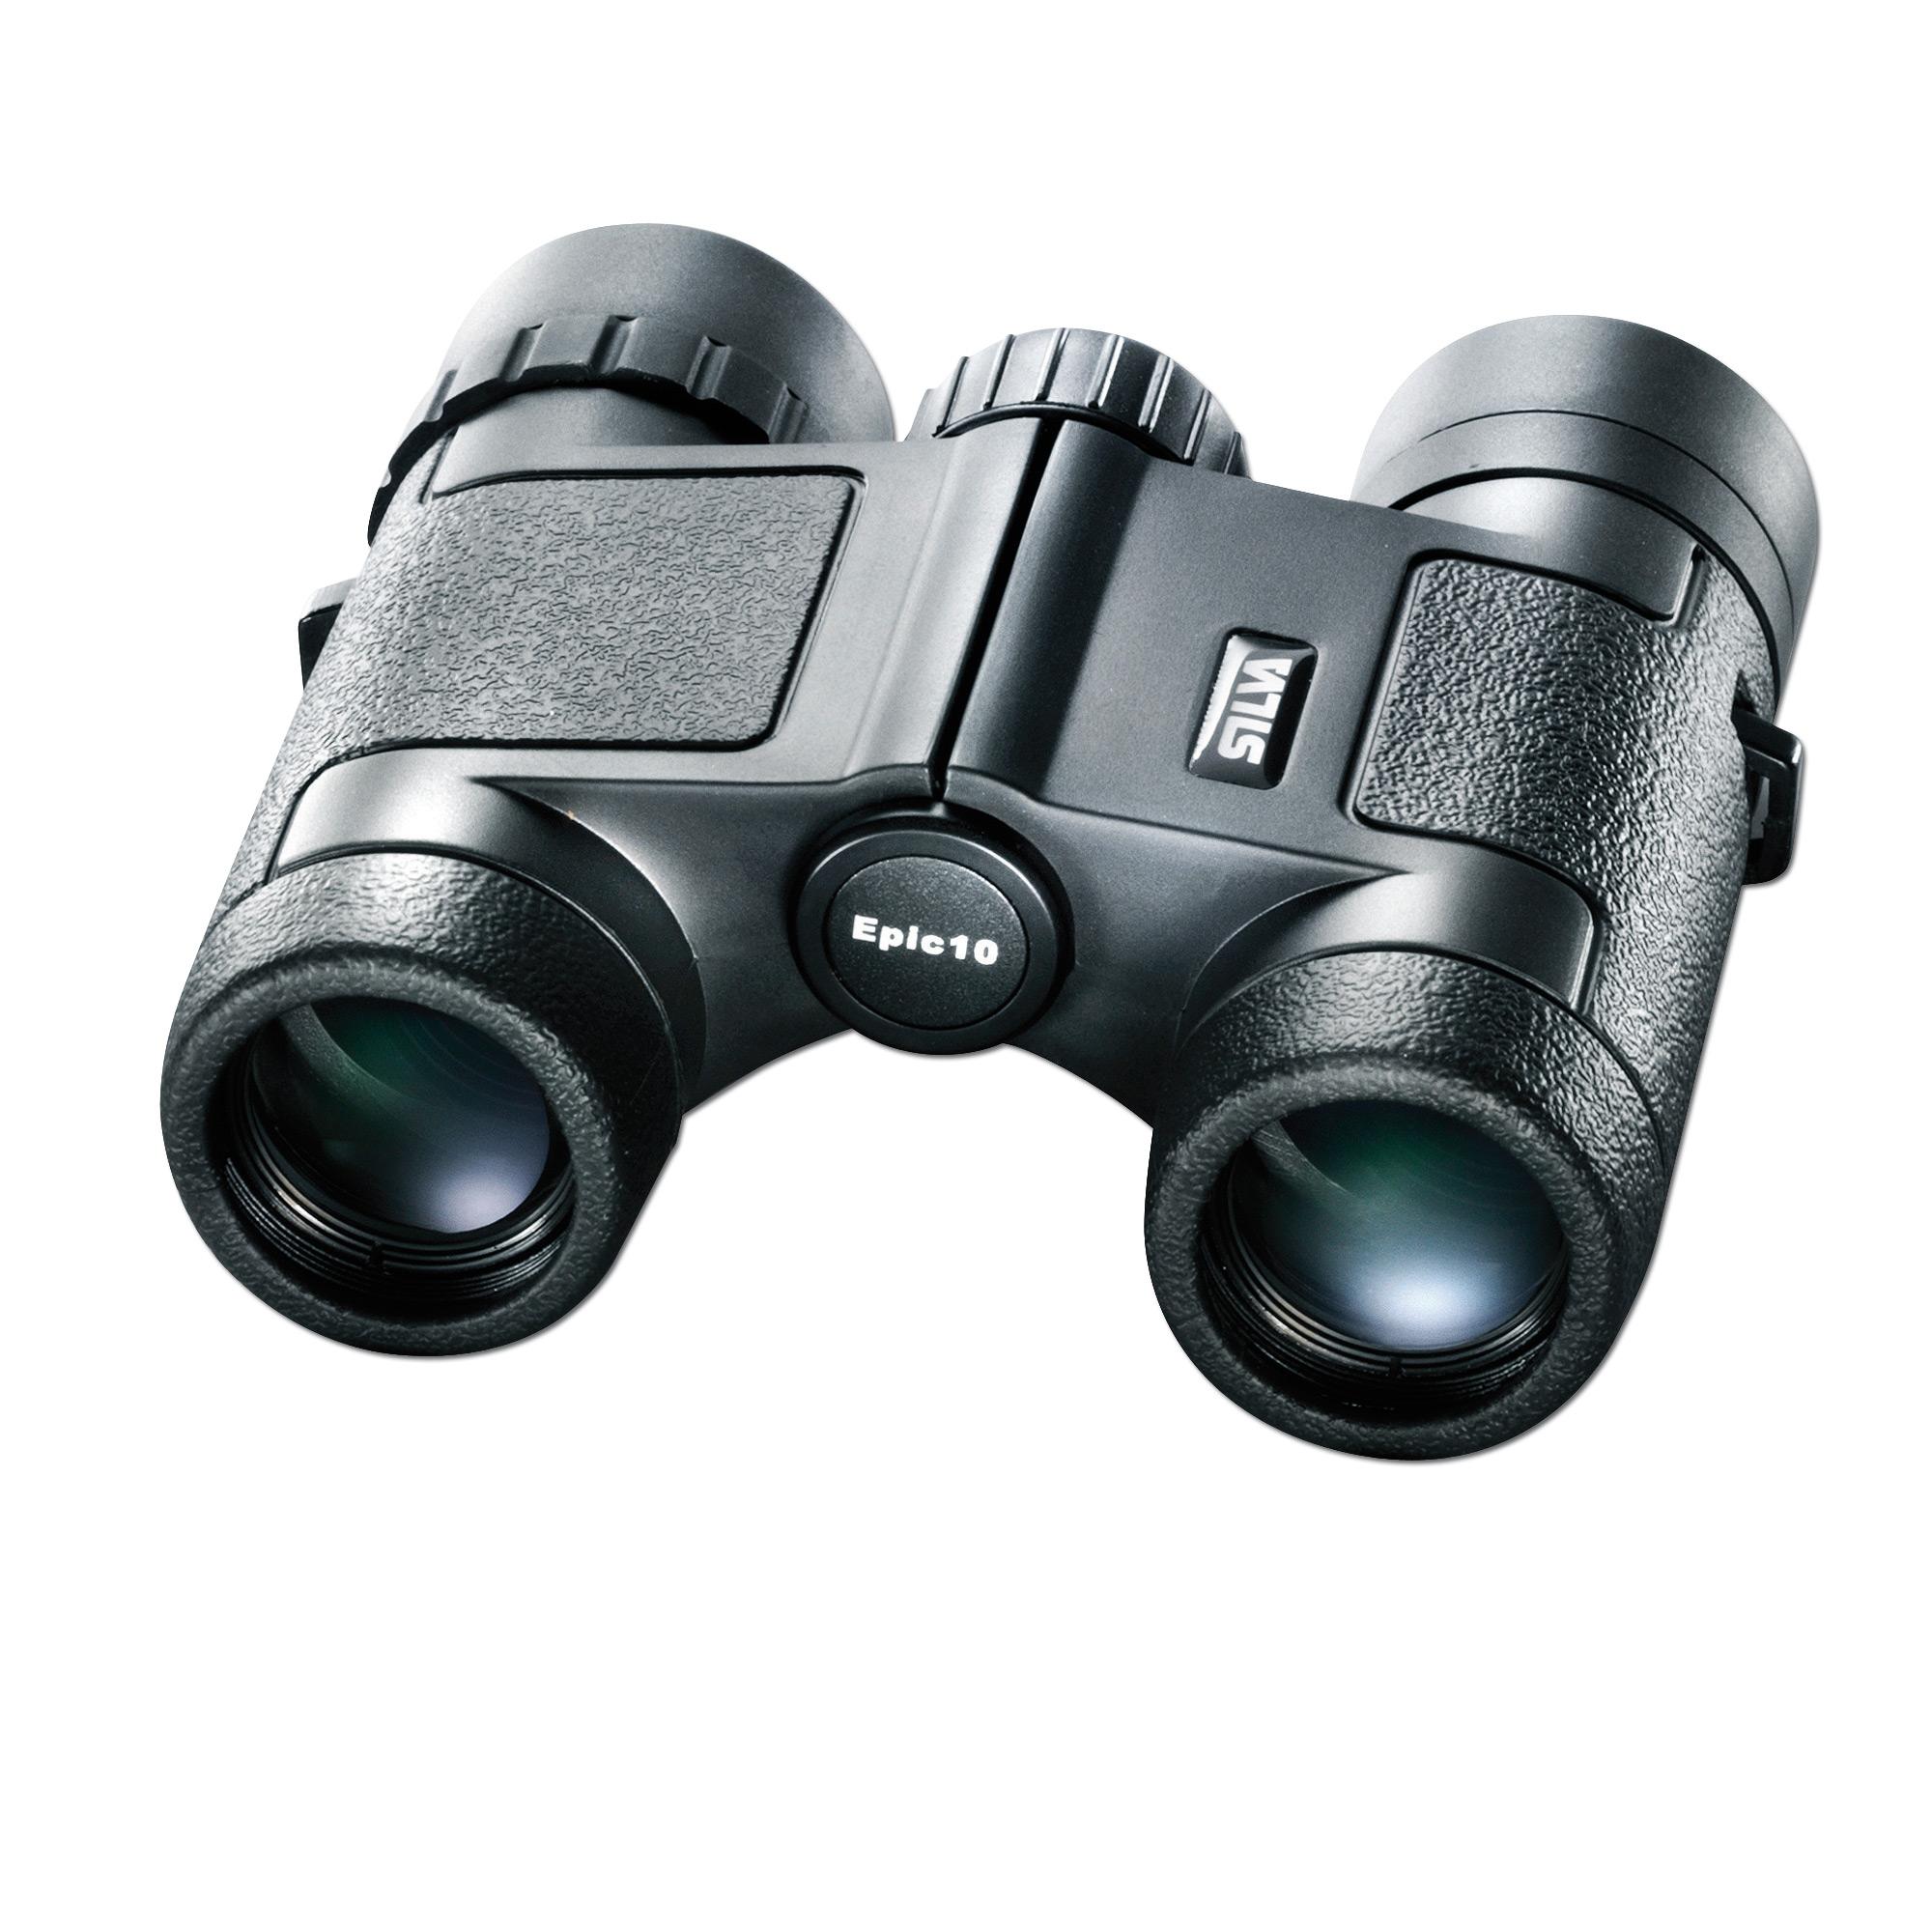 Binoculars Silva Epic 10x25